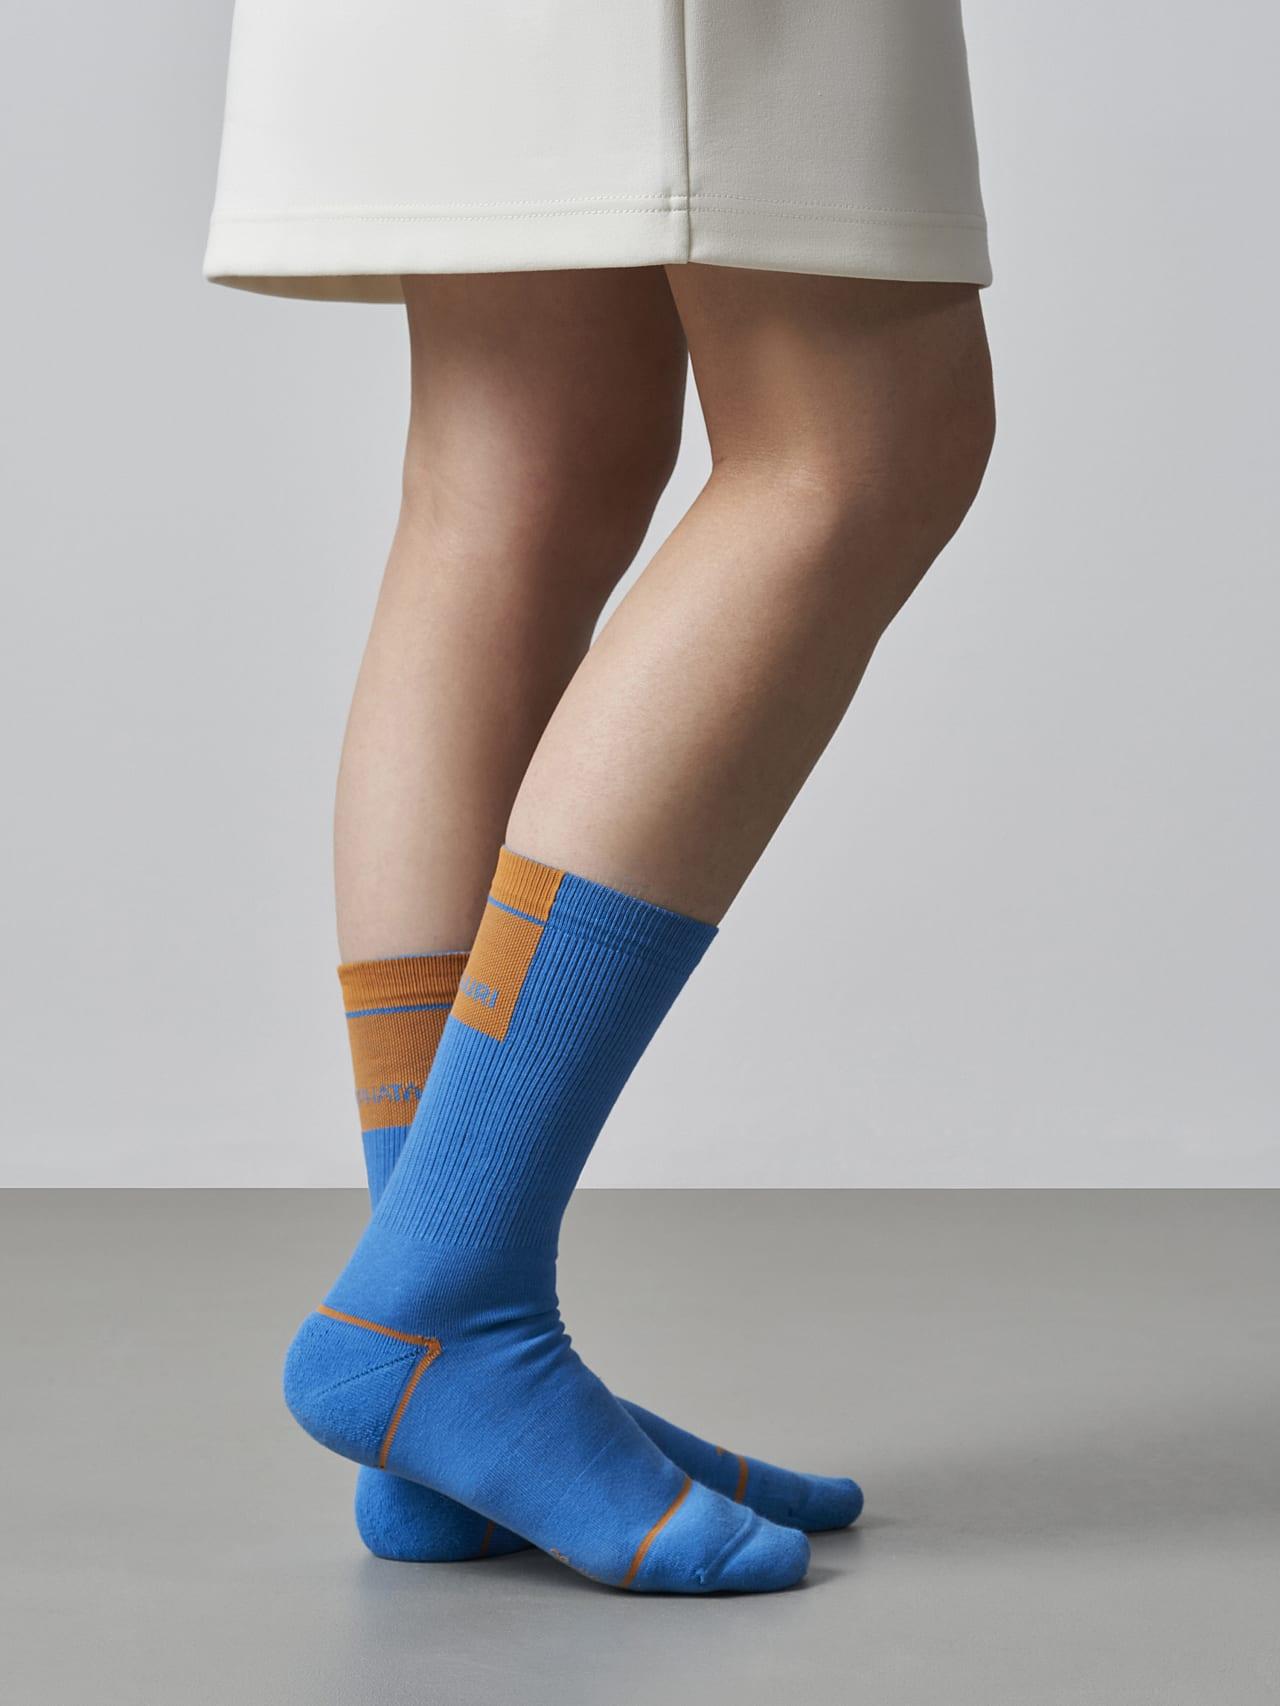 ATENI V3.Y5.02 Premium Knit Socks blue Model shot Alpha Tauri